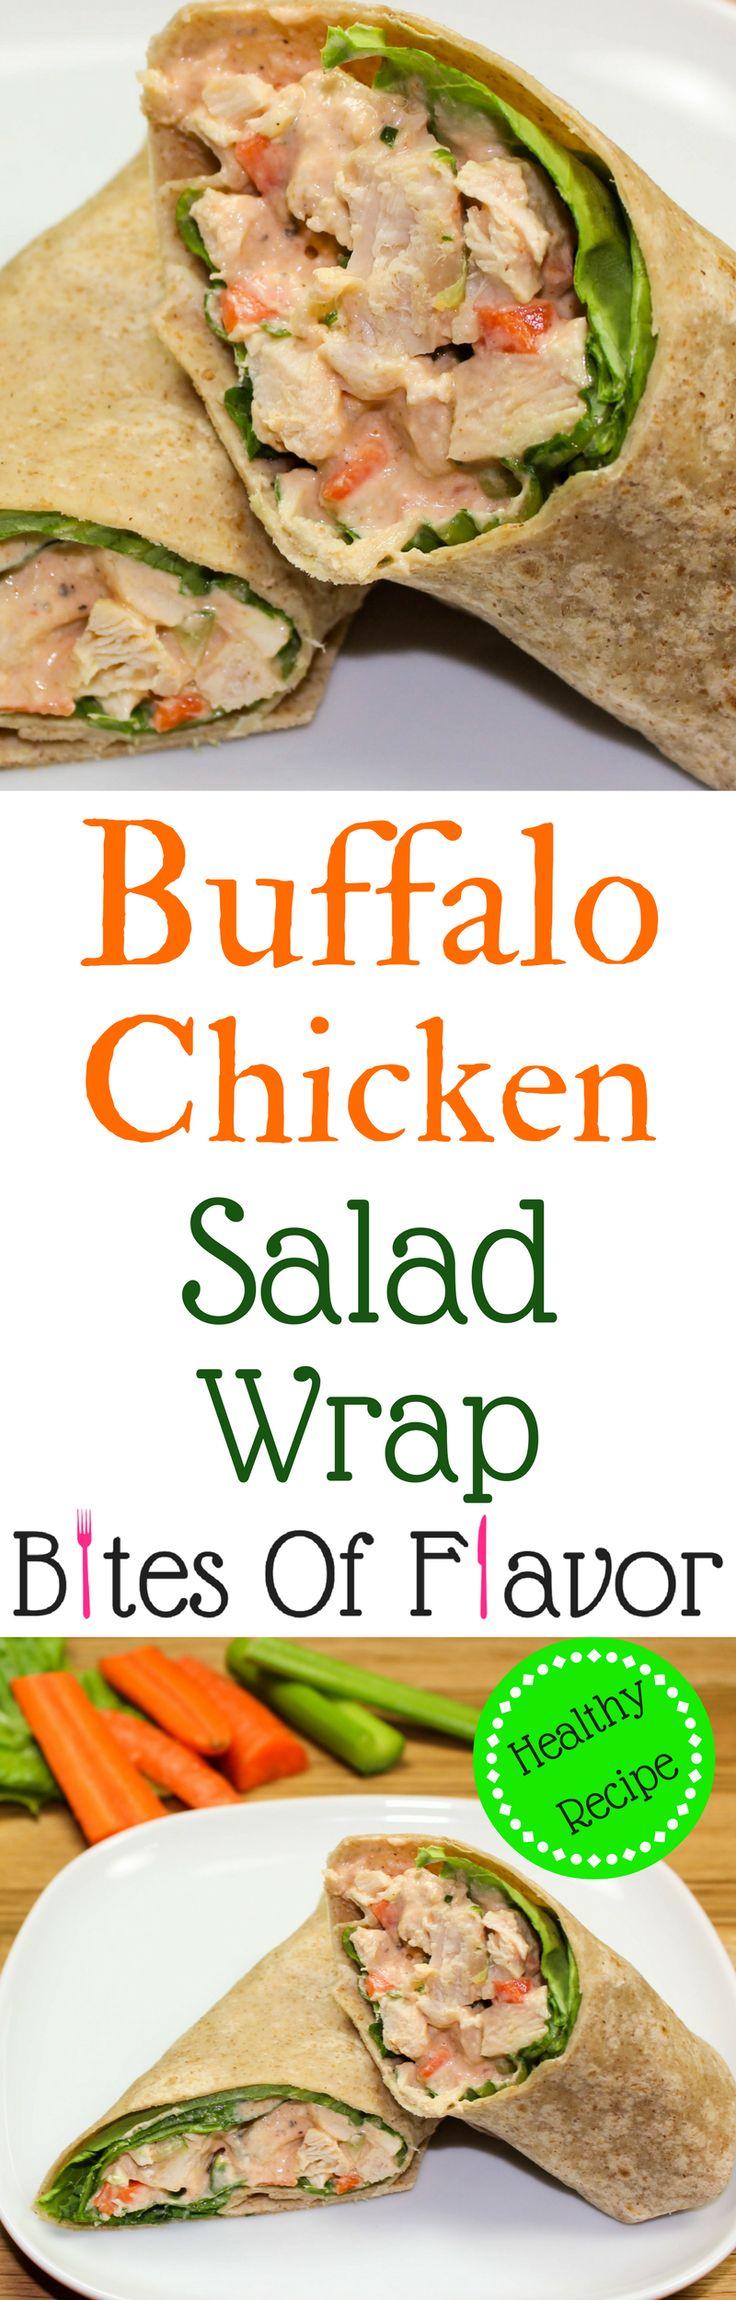 Buffalo Chicken Salad-Unique & healthy twist on classic chicken salad. Flavorful chicken mixed with buffalo sauce & fresh veggies. Weight Watcher friendly (5 SmartPoints)!